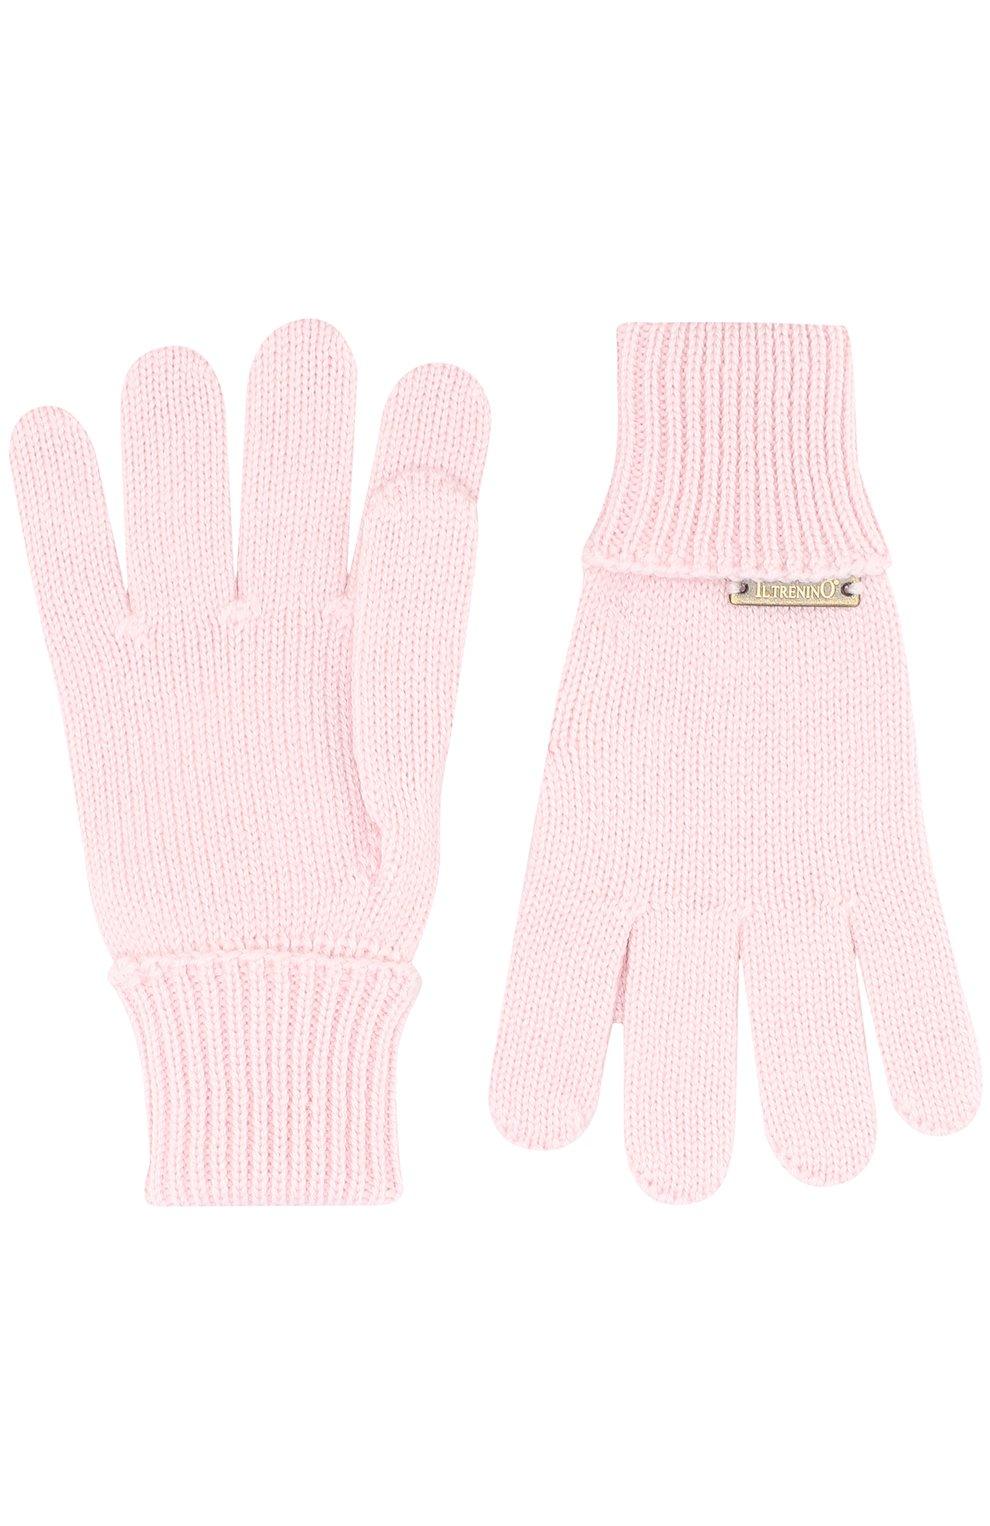 Детские шерстяные перчатки IL TRENINO светло-розового цвета, арт. 17 5059/E3 | Фото 2